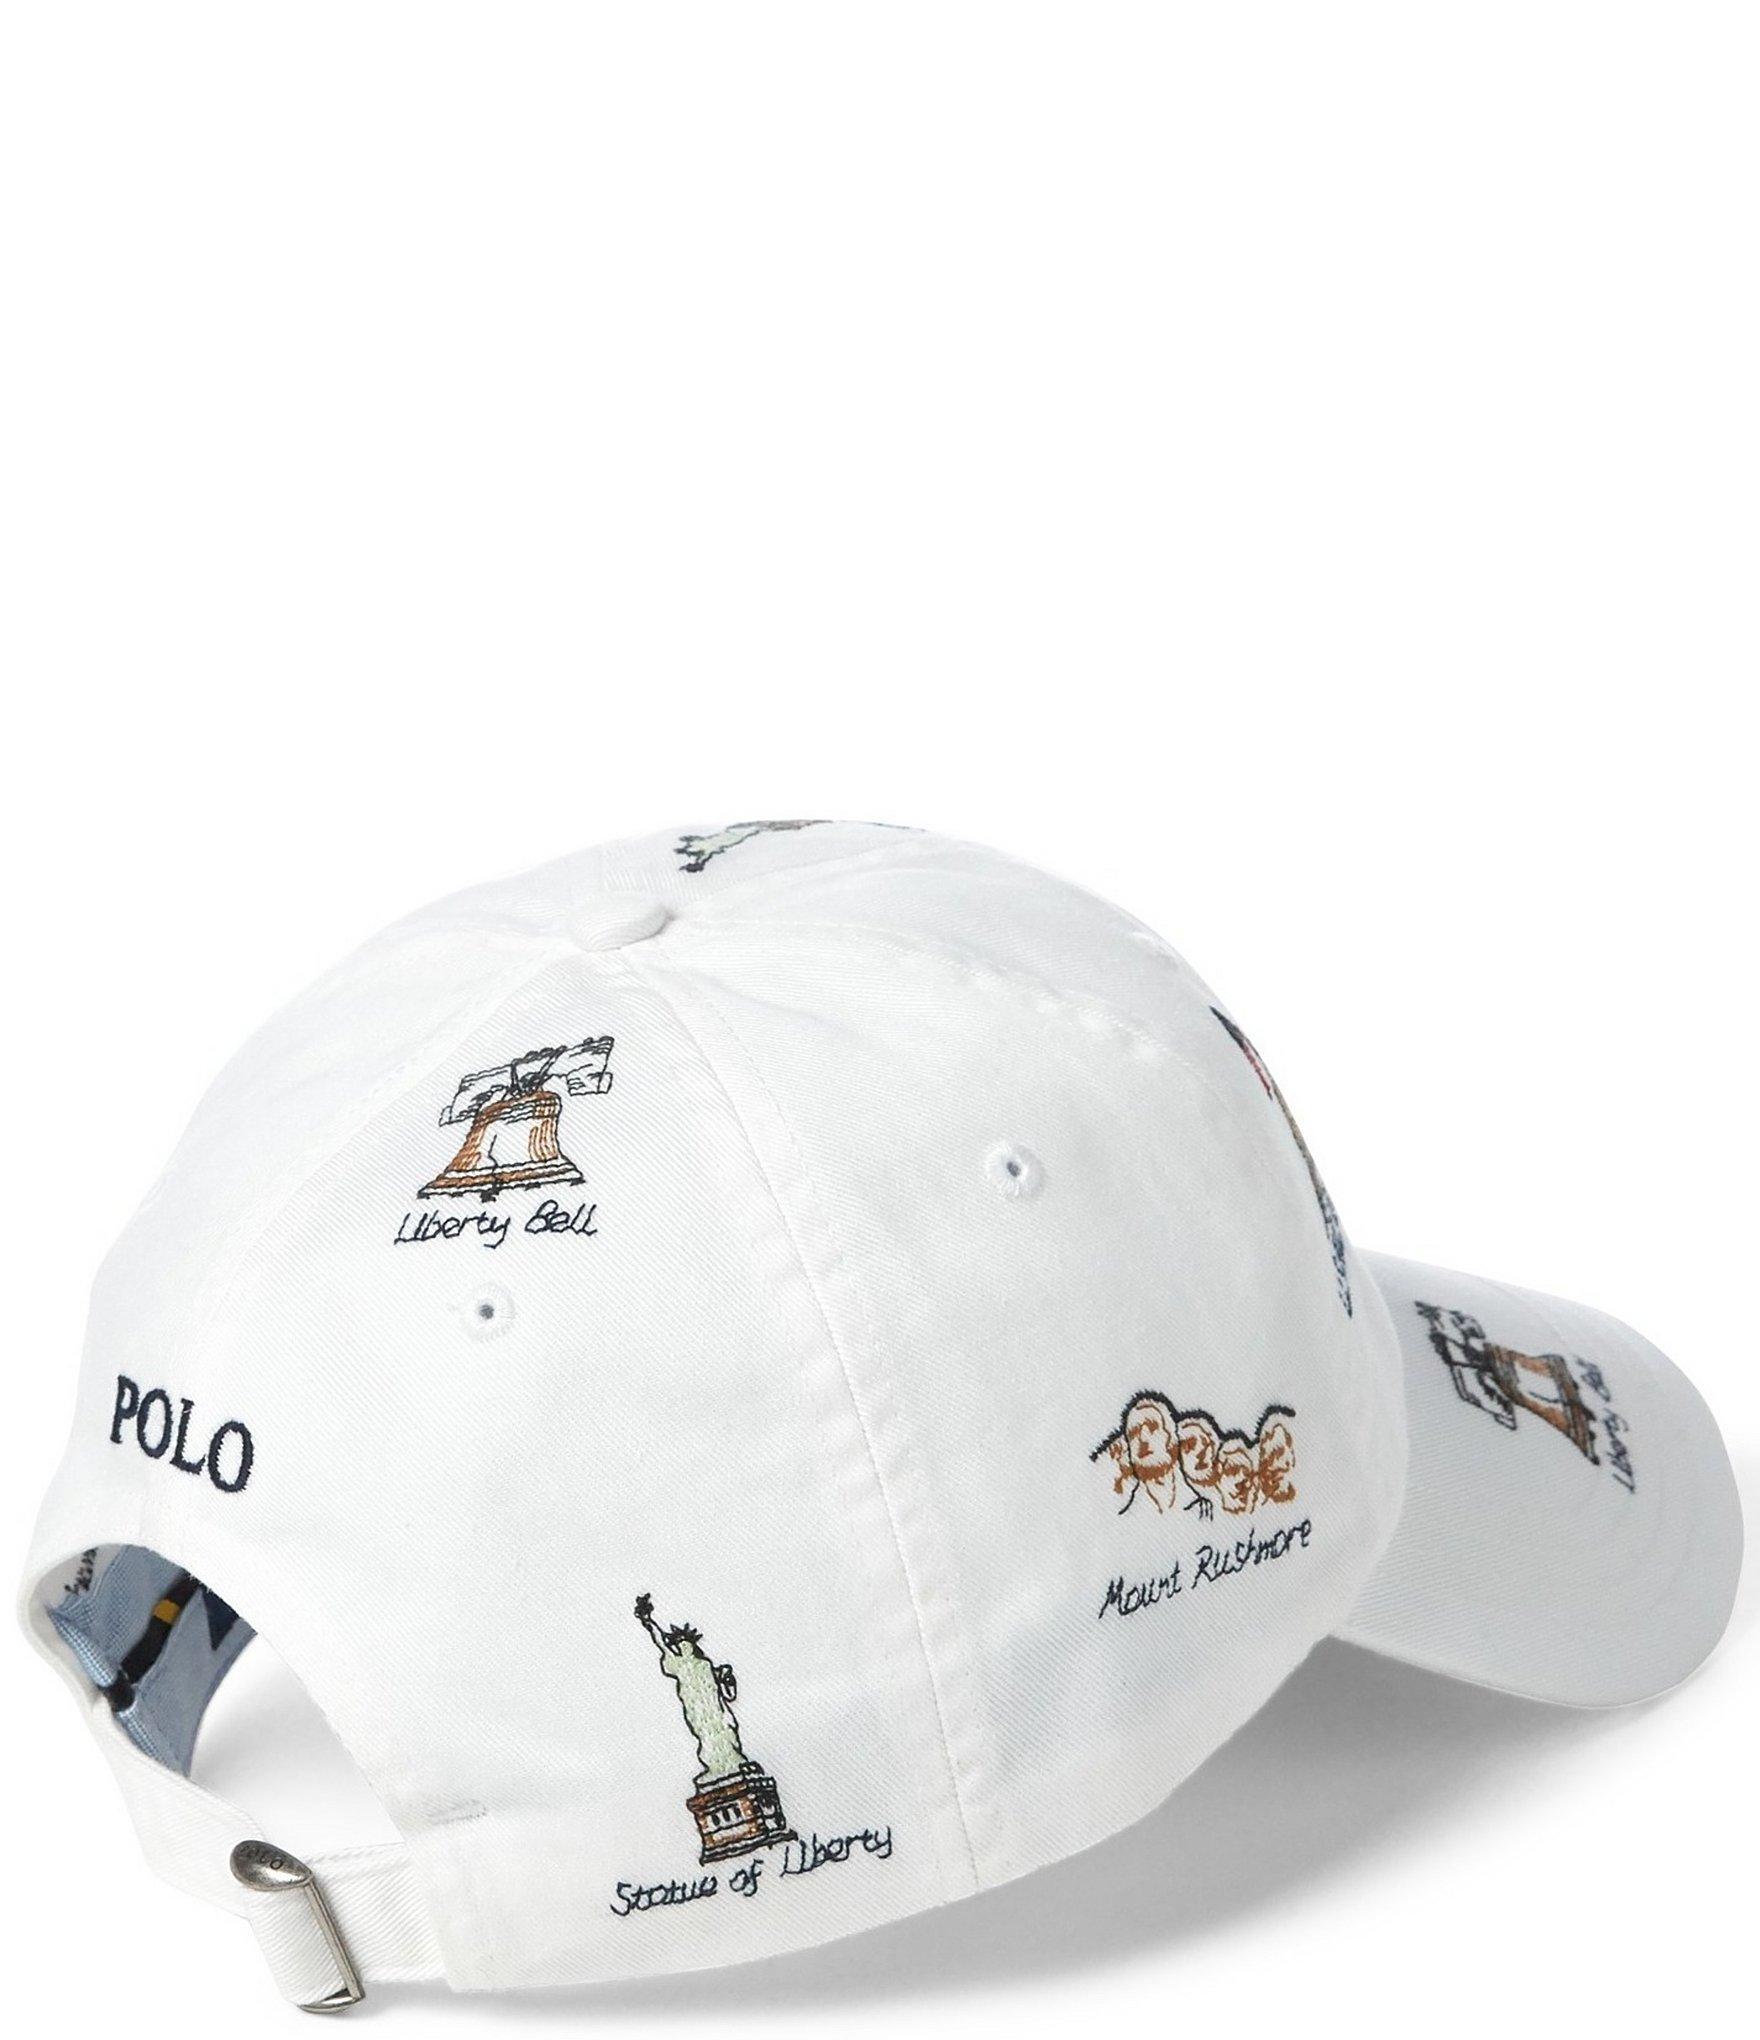 5b8f3367 Polo Ralph Lauren - White Monuments Chino Baseball Cap for Men - Lyst. View  fullscreen